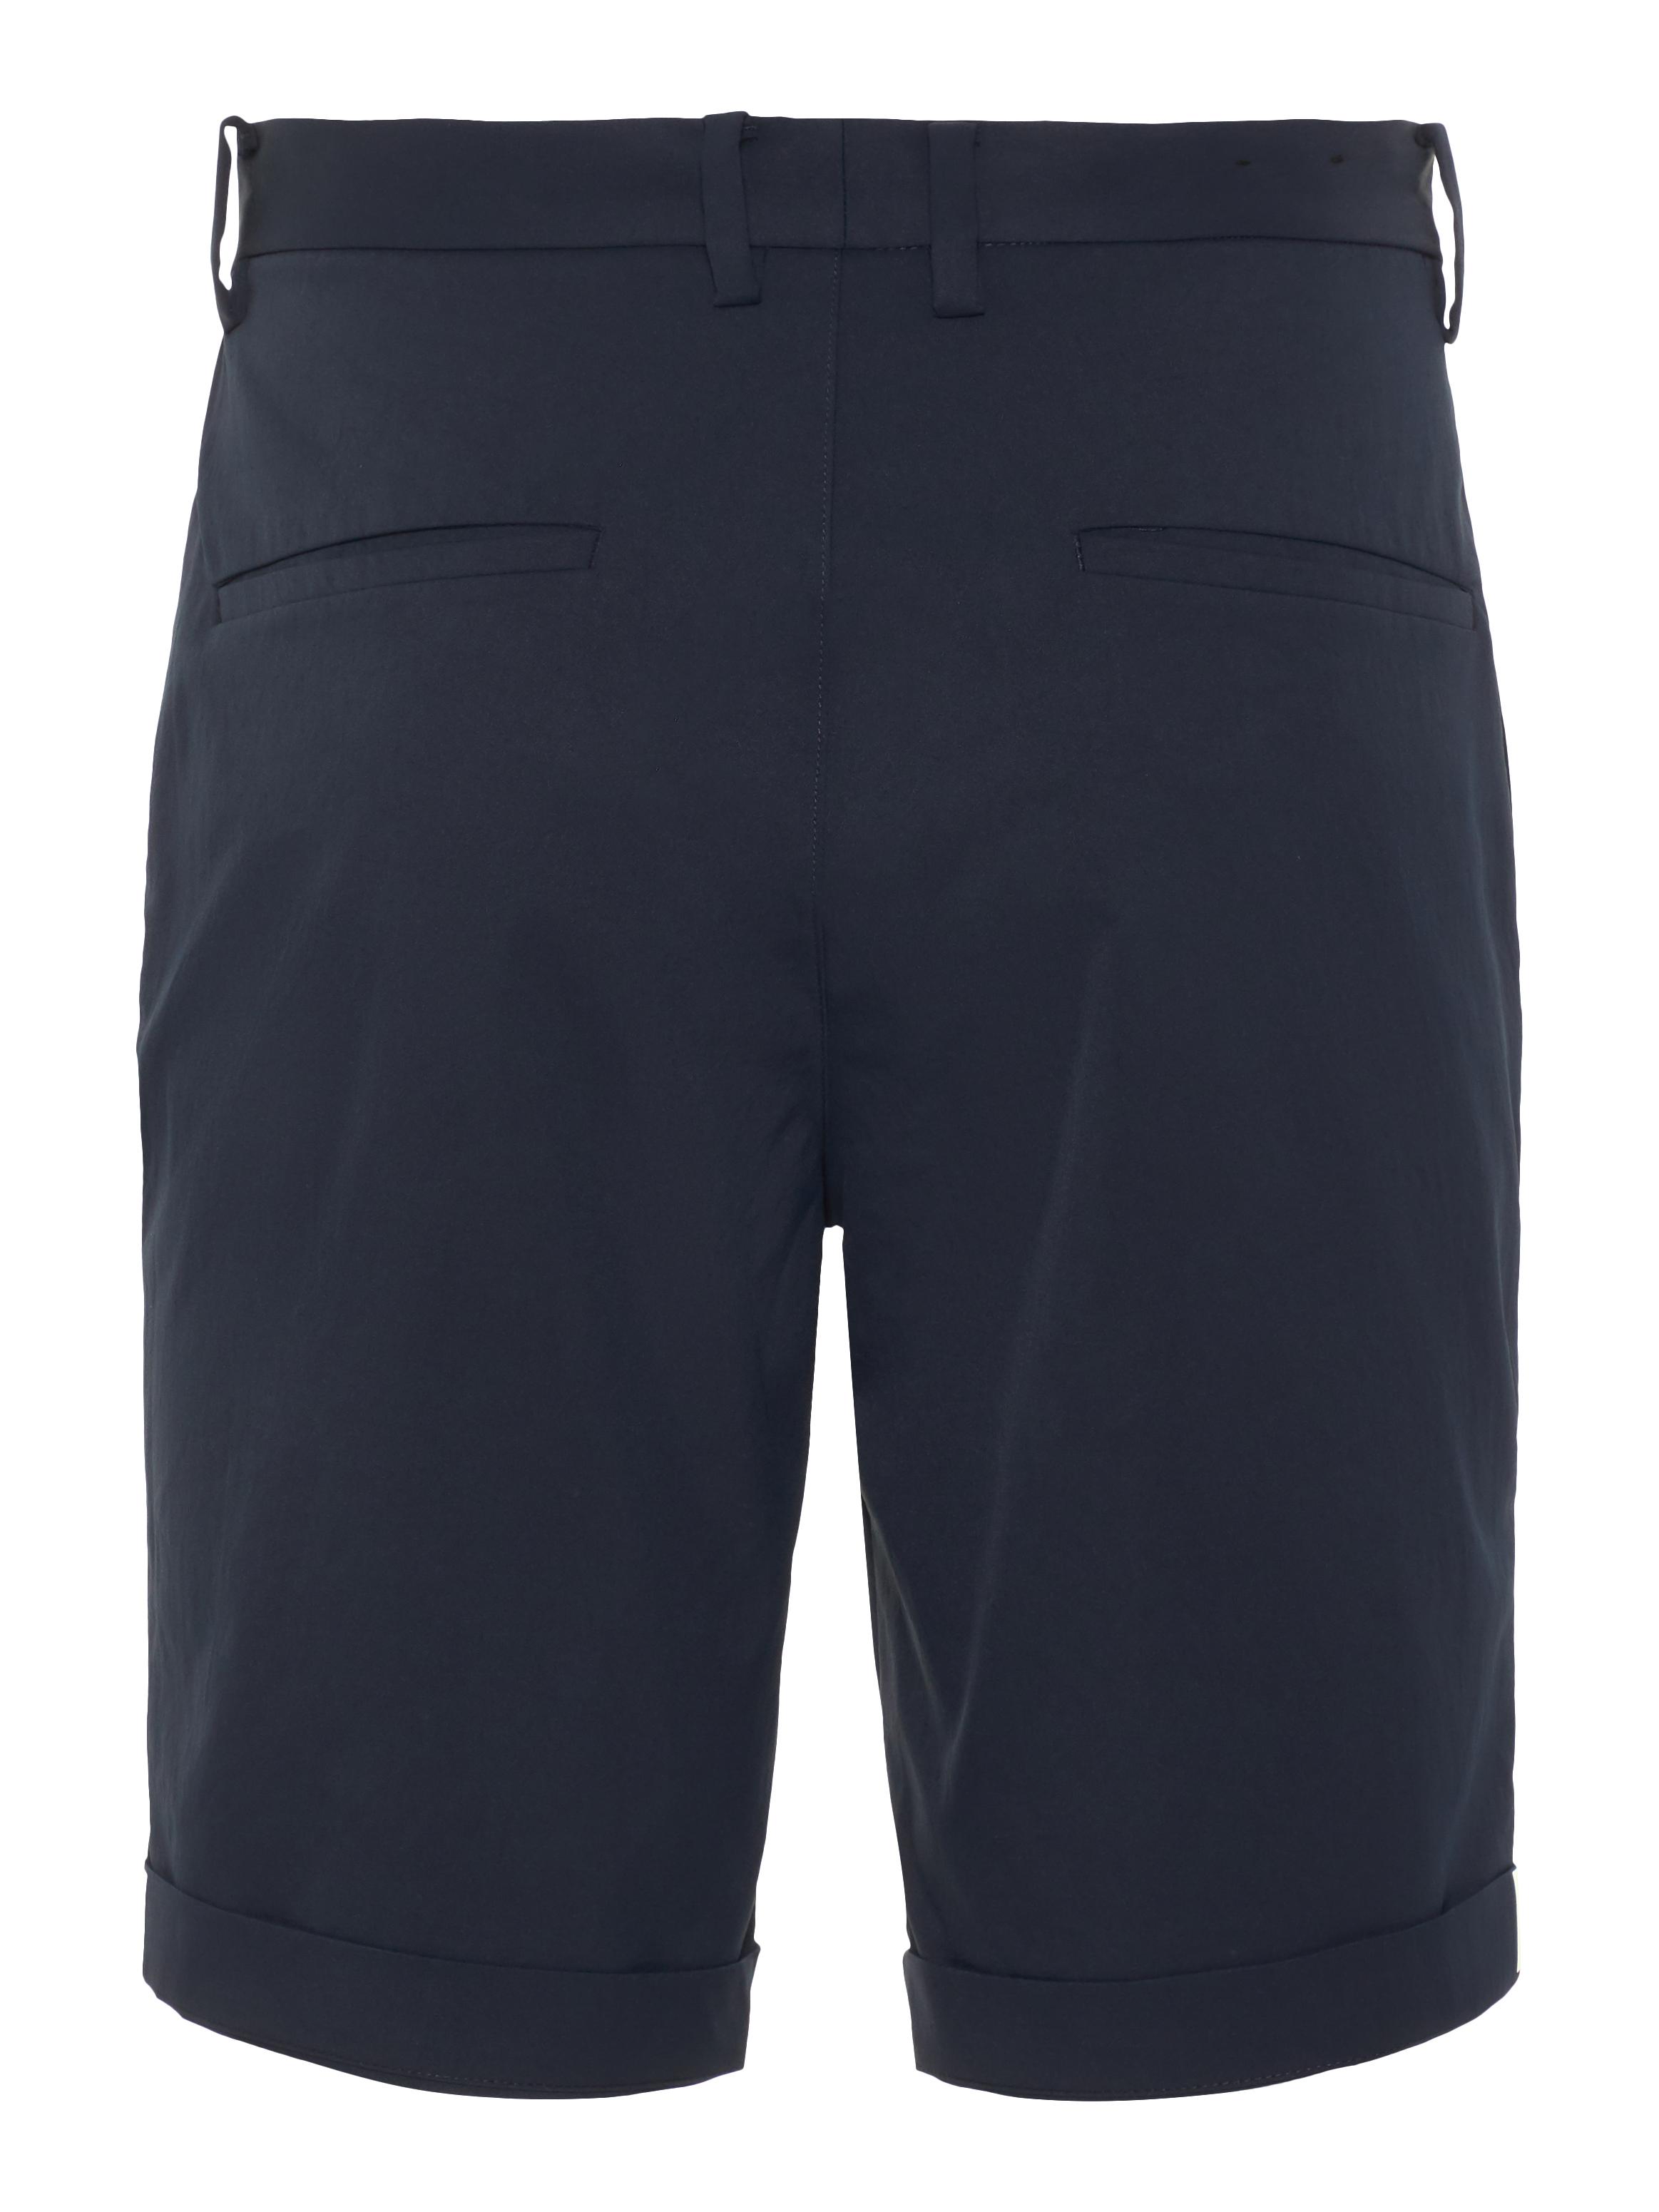 J. Lindeberg Herren Vent Shorts-high vent schwarz